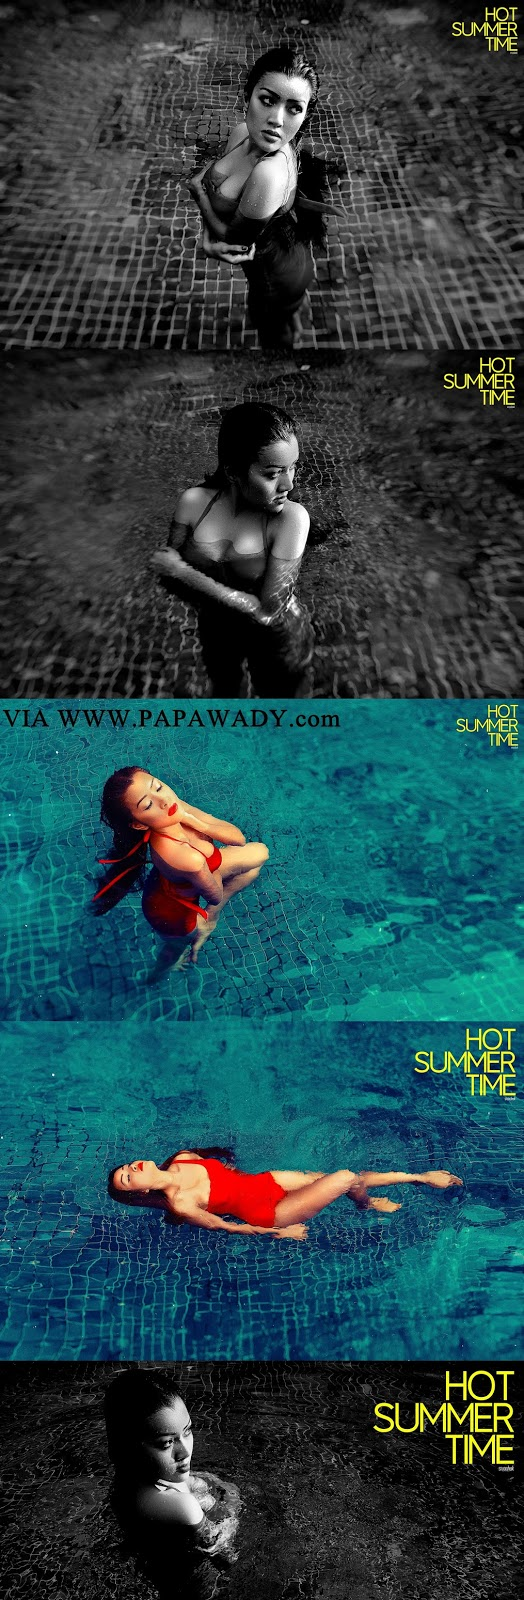 Poe Ei Phyu Zin - Summer Time Photoshoot By HAK